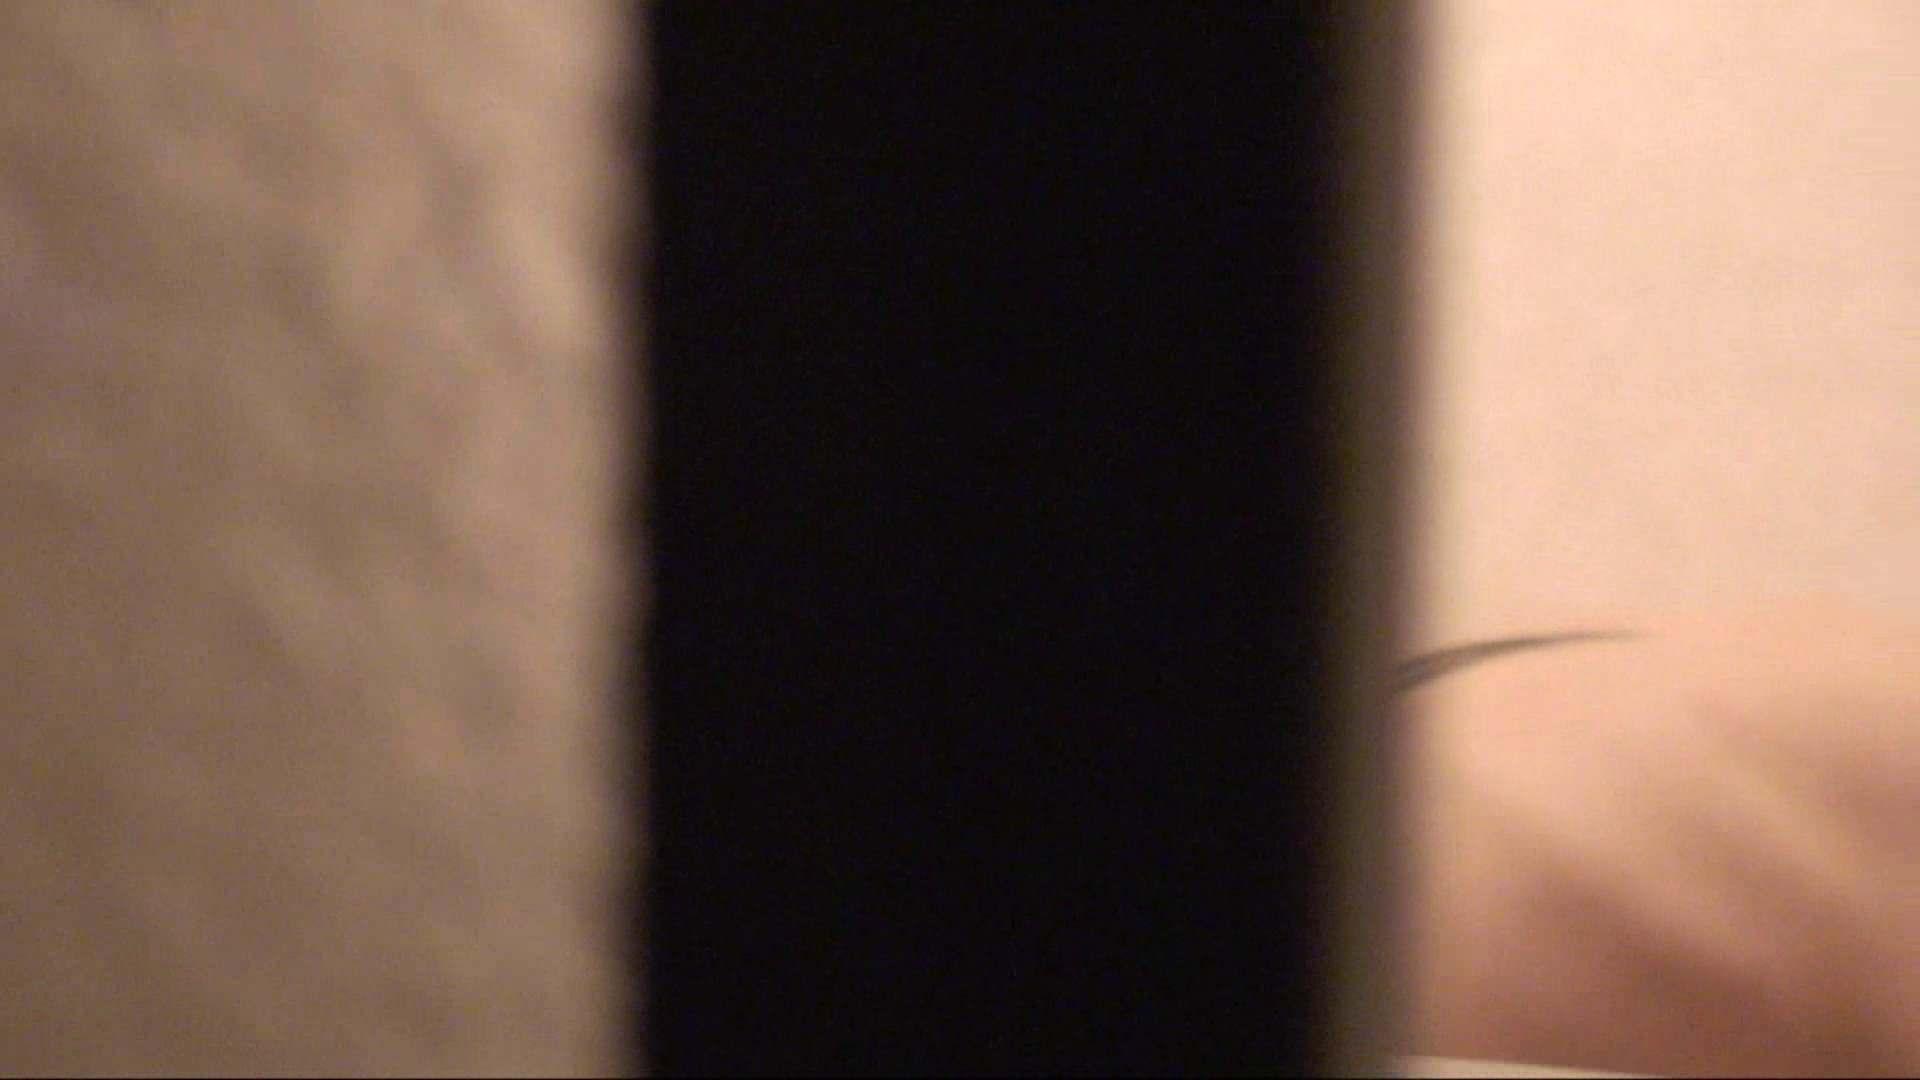 vol.01必見!白肌嬢の乳首が丸見え。極上美人のすっぴん顔をハイビジョンで! 乳首 オメコ動画キャプチャ 89pic 67